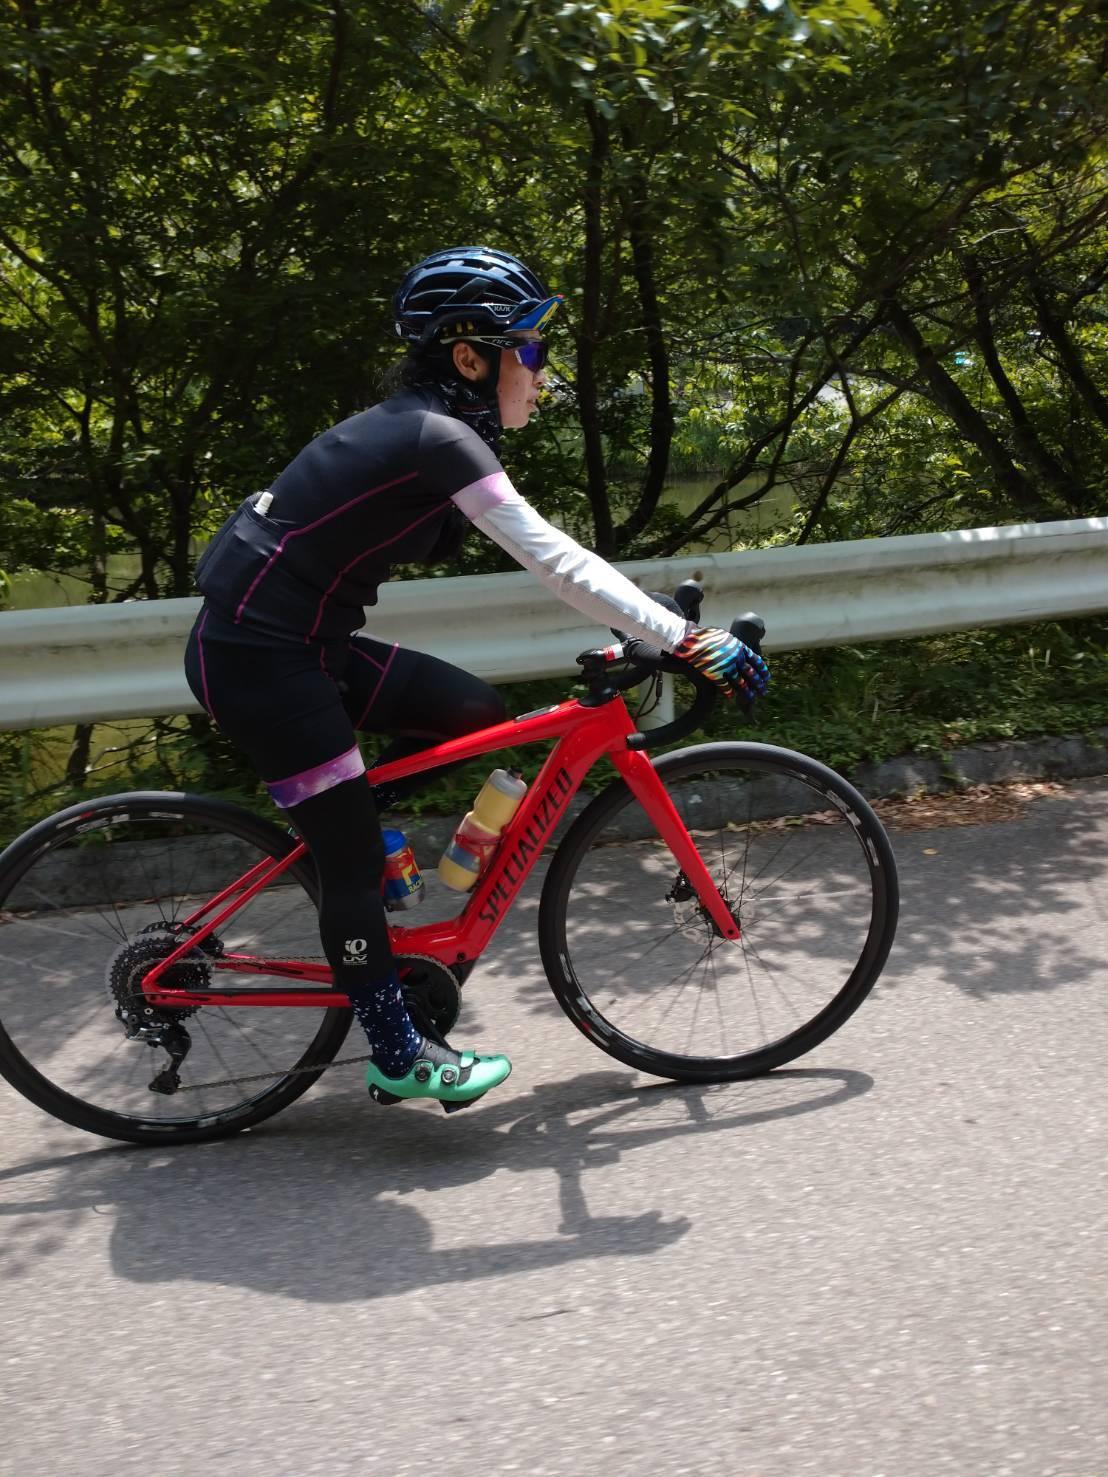 SPECIALIZED e-バイク CREO SL E5 COMP試乗出来ます!!_e0365437_19392414.jpeg